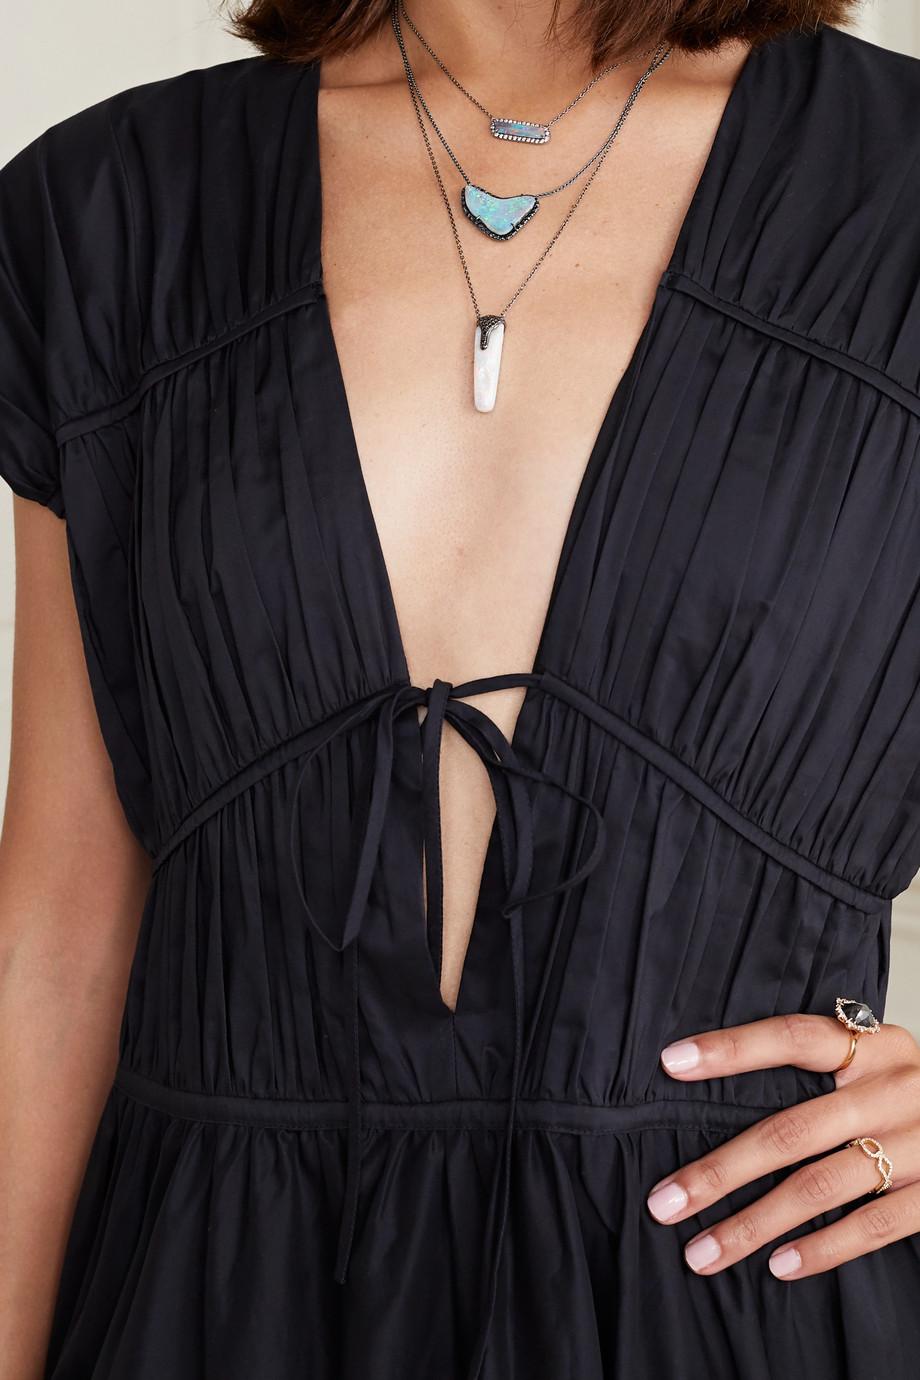 Kimberly McDonald 18-karat blackened white gold, opal and diamond necklace